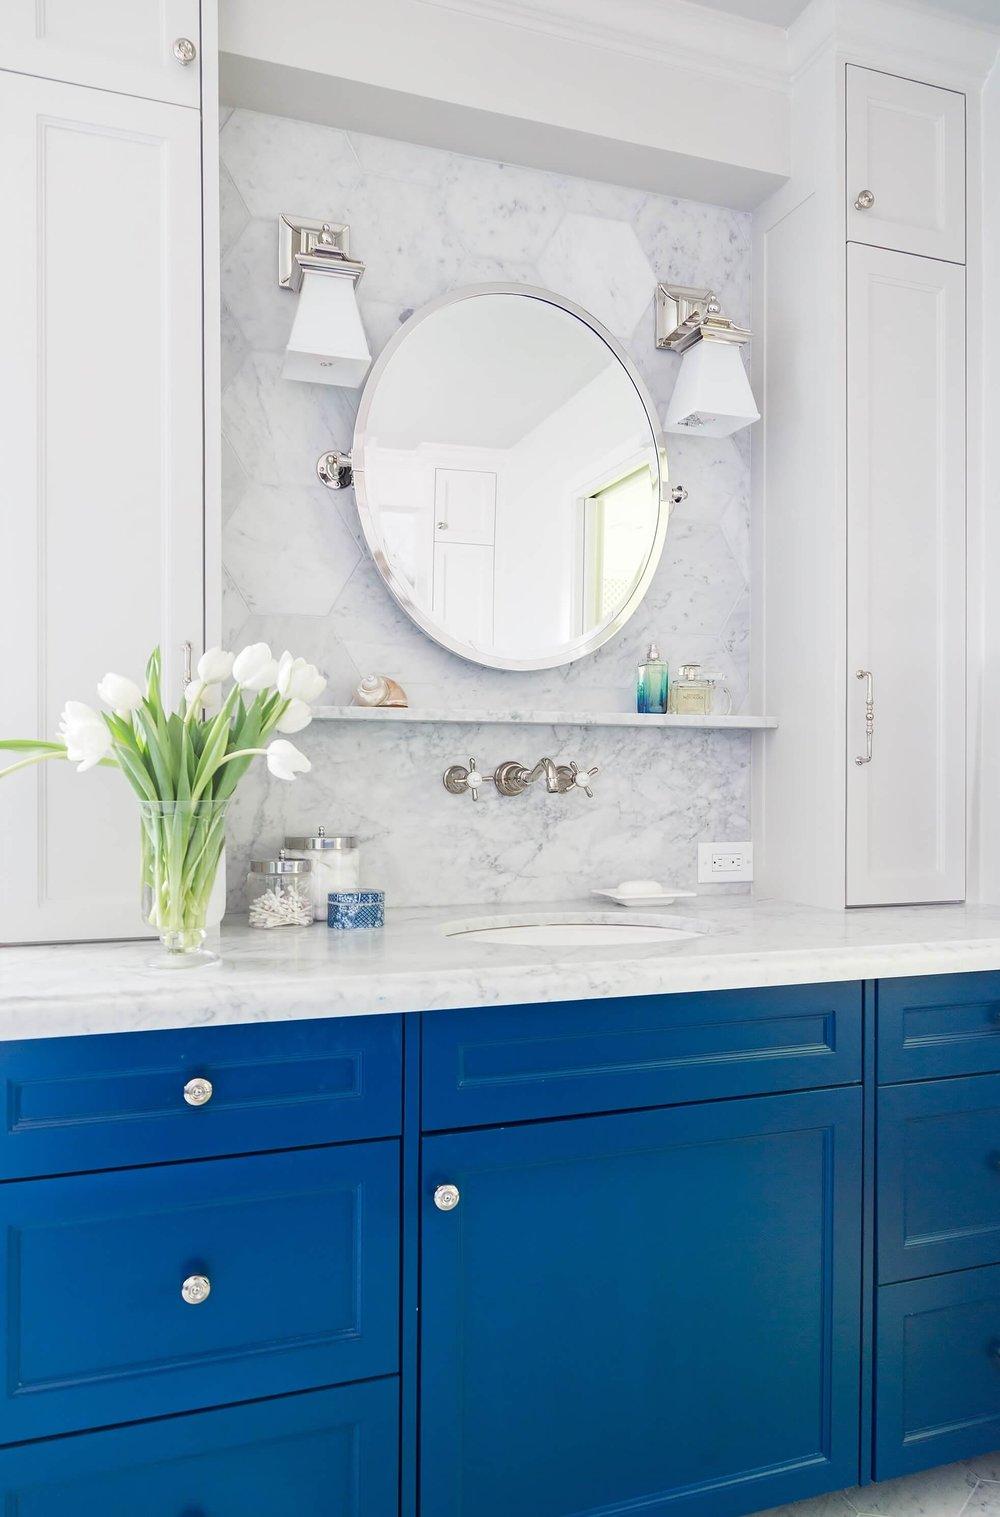 Master bathroom remodel with 12 inch deep upper cabinet as medicine cabinet - Designer: Carla Aston, Photographer: Tori Aston #medicinecabinet #bathroomcabinets